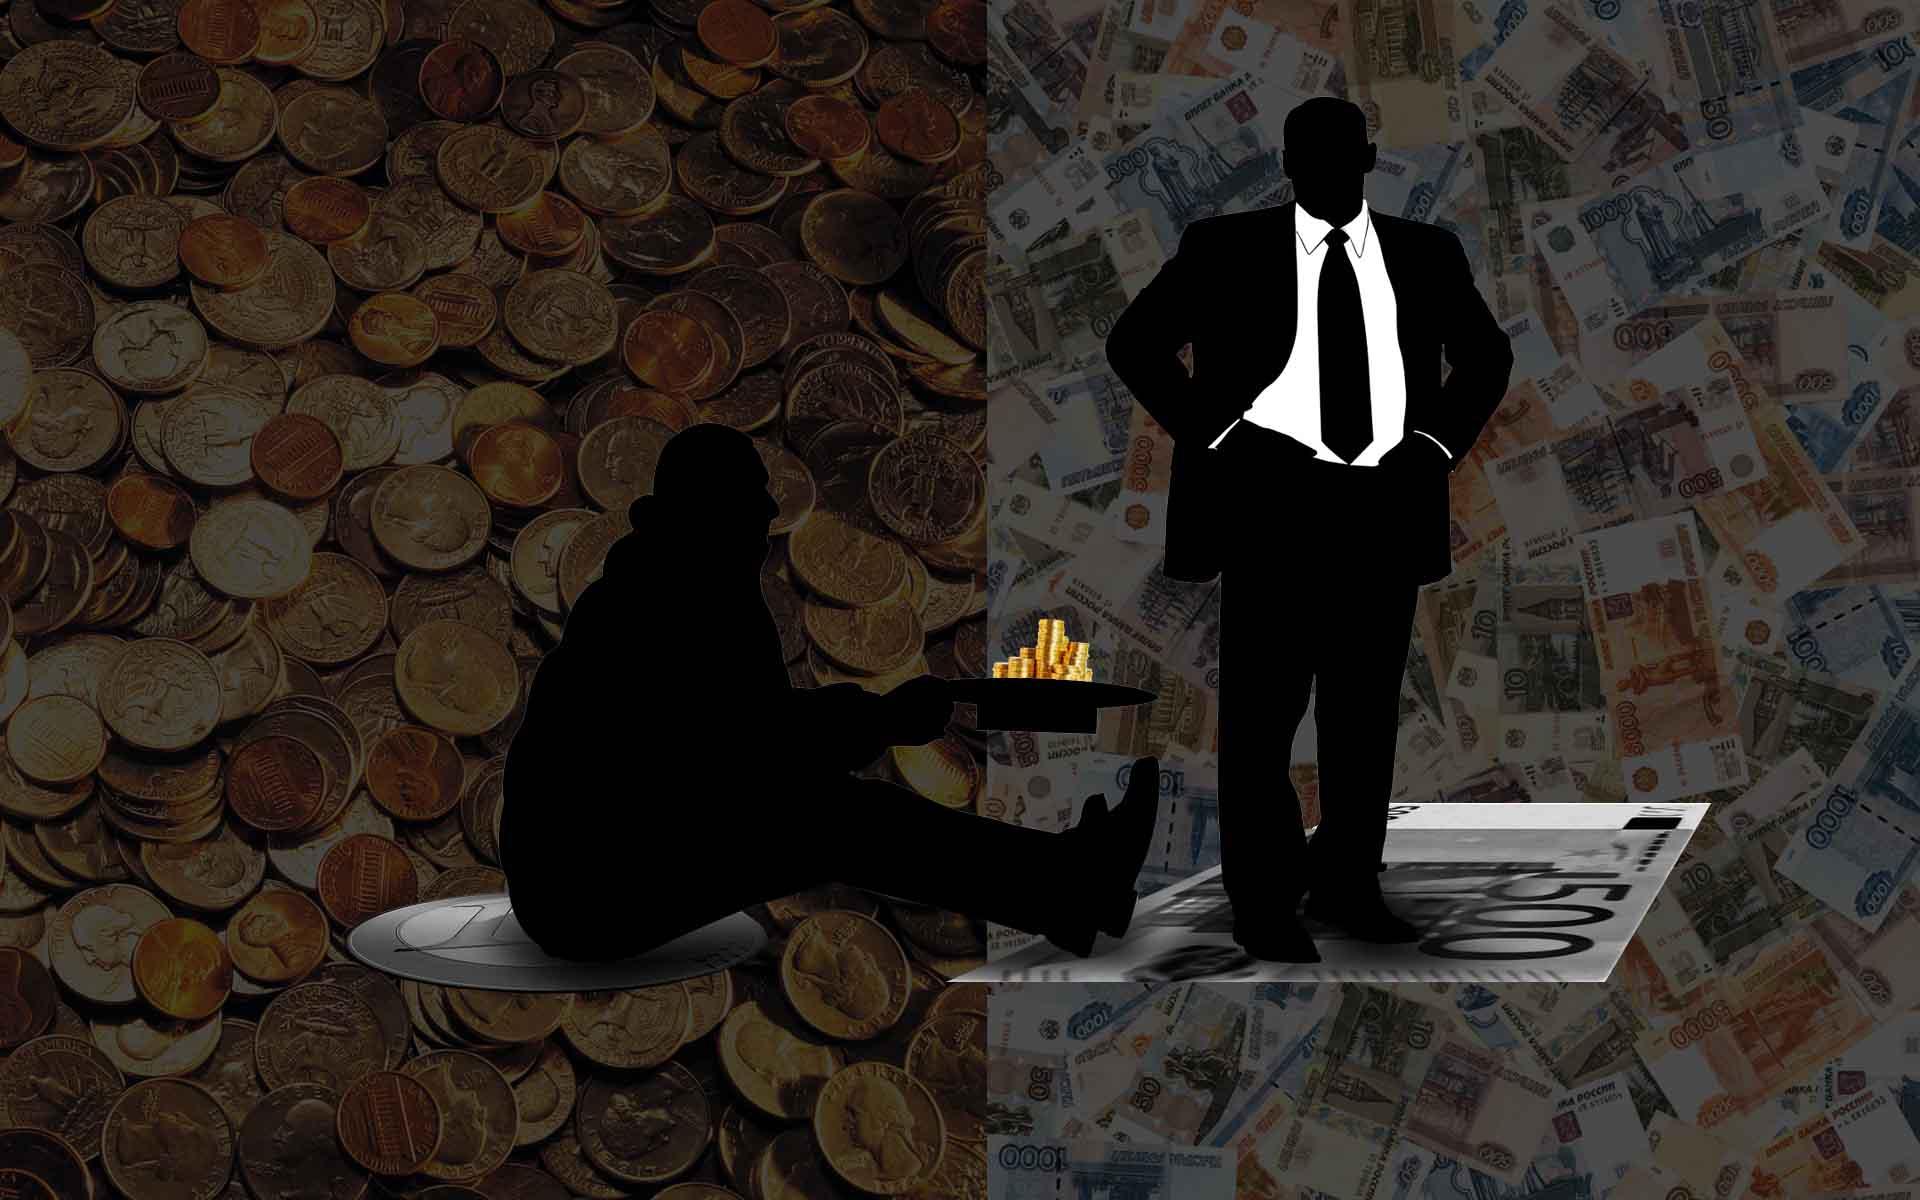 Богатый и нищий картинки